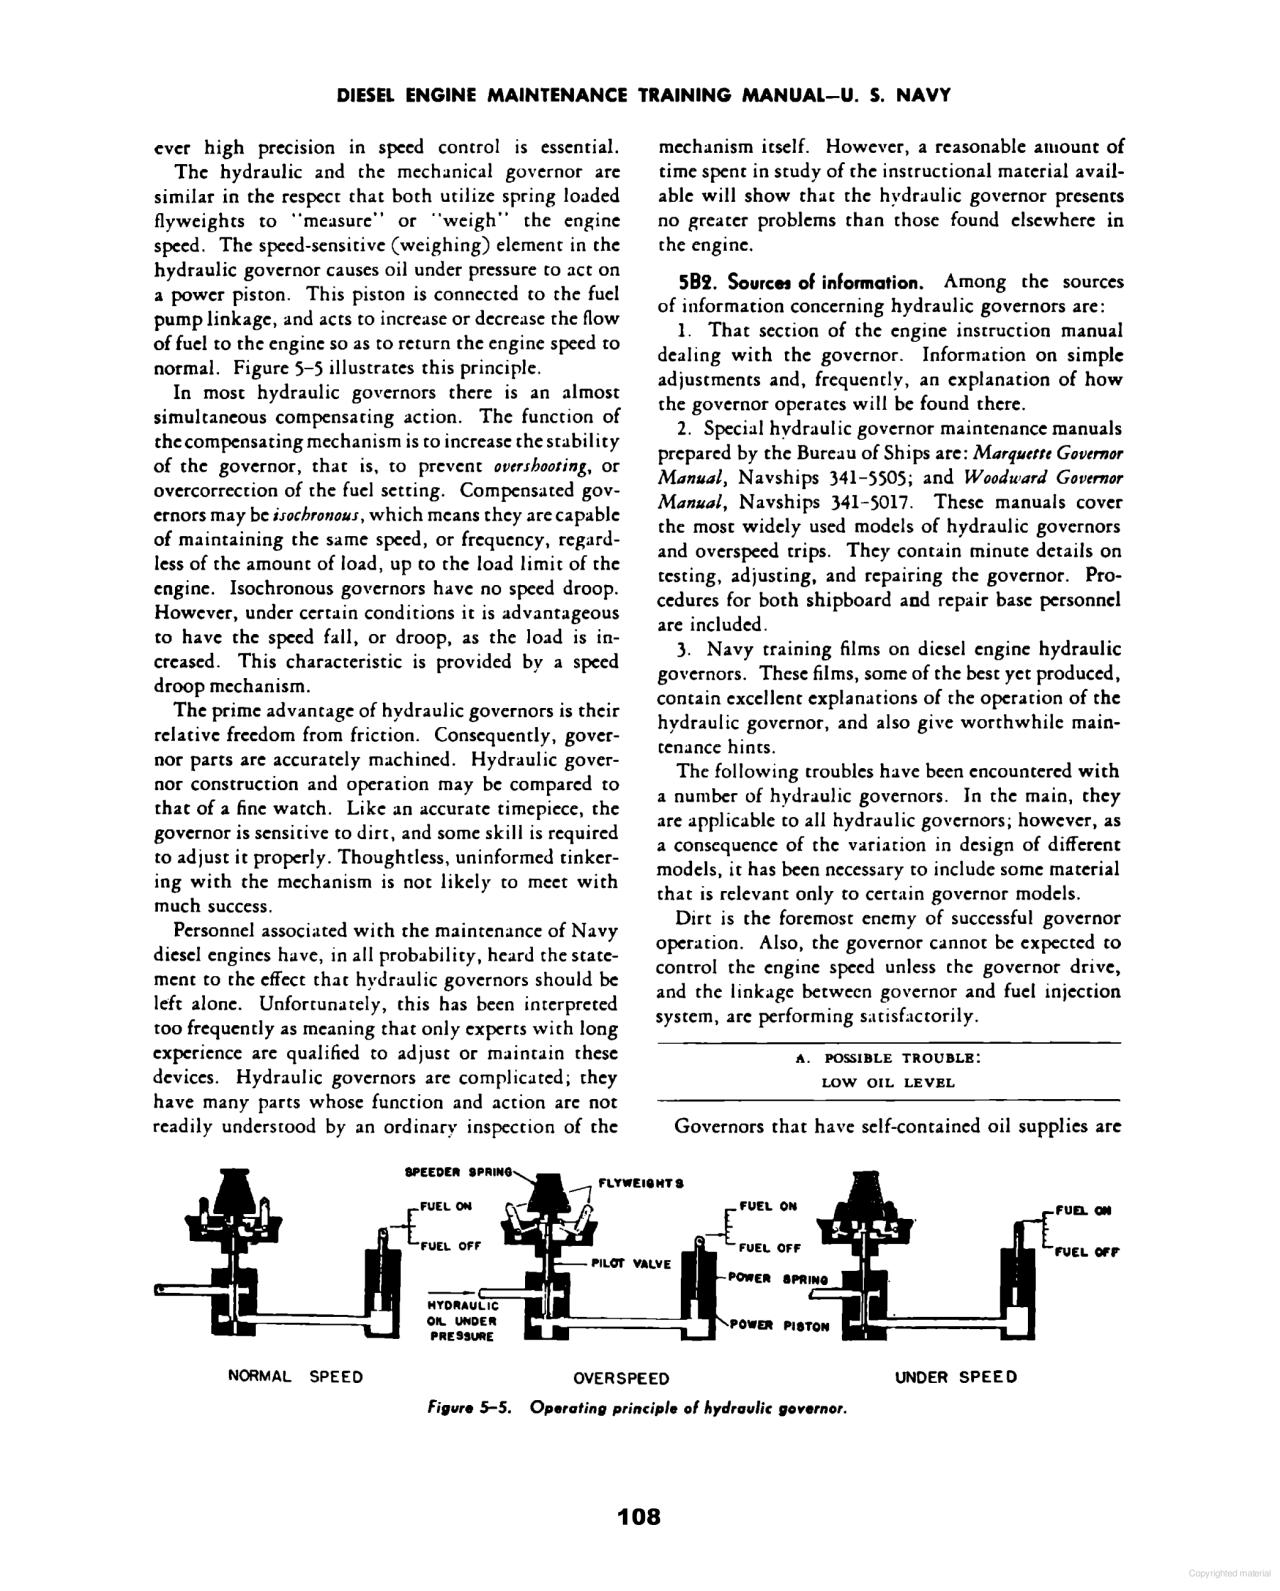 User Guide · Diesel Engine Maintenance Training Manual